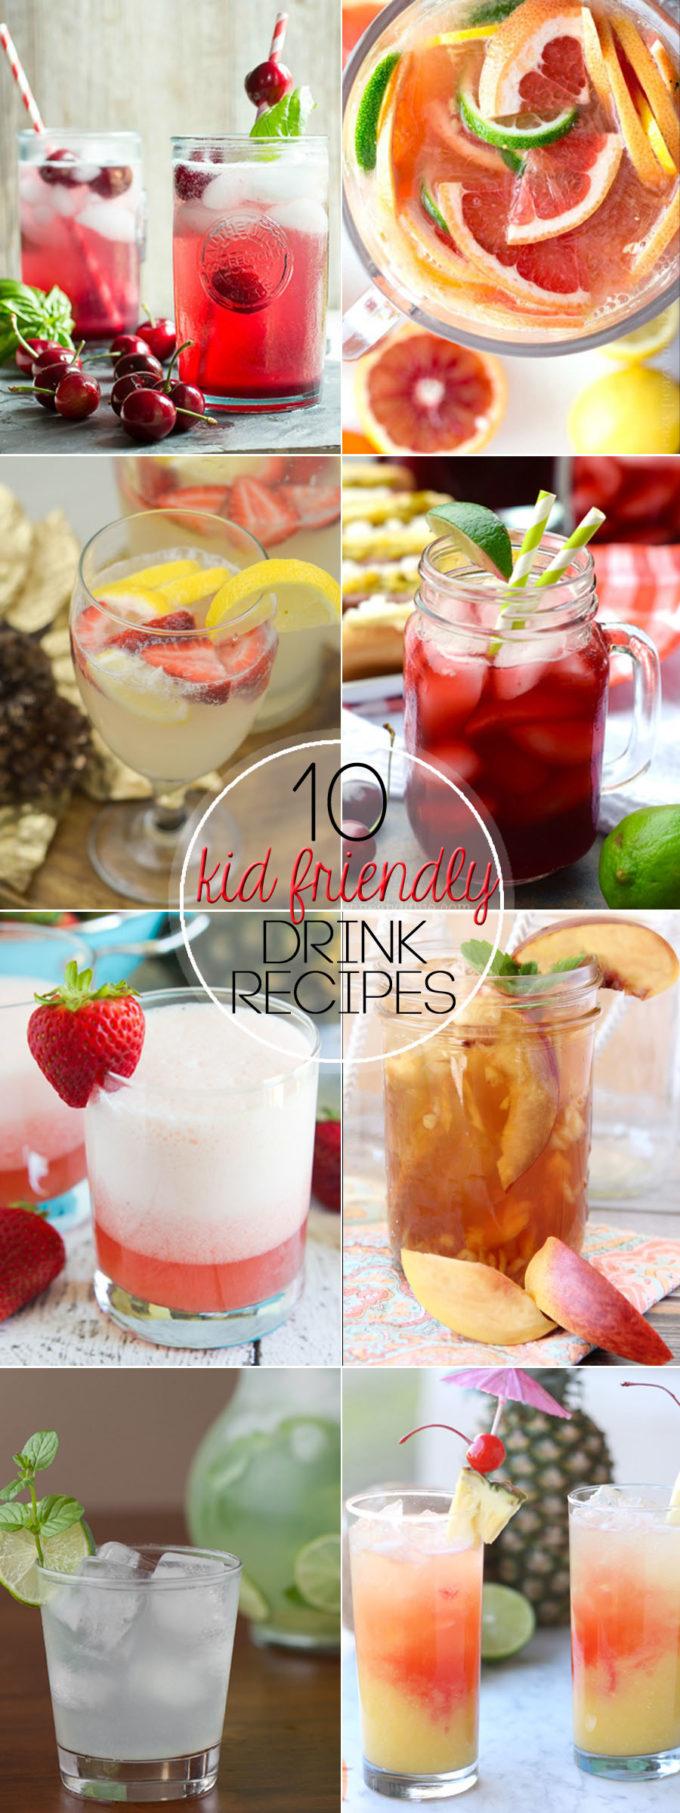 10 Kid friendly drinks